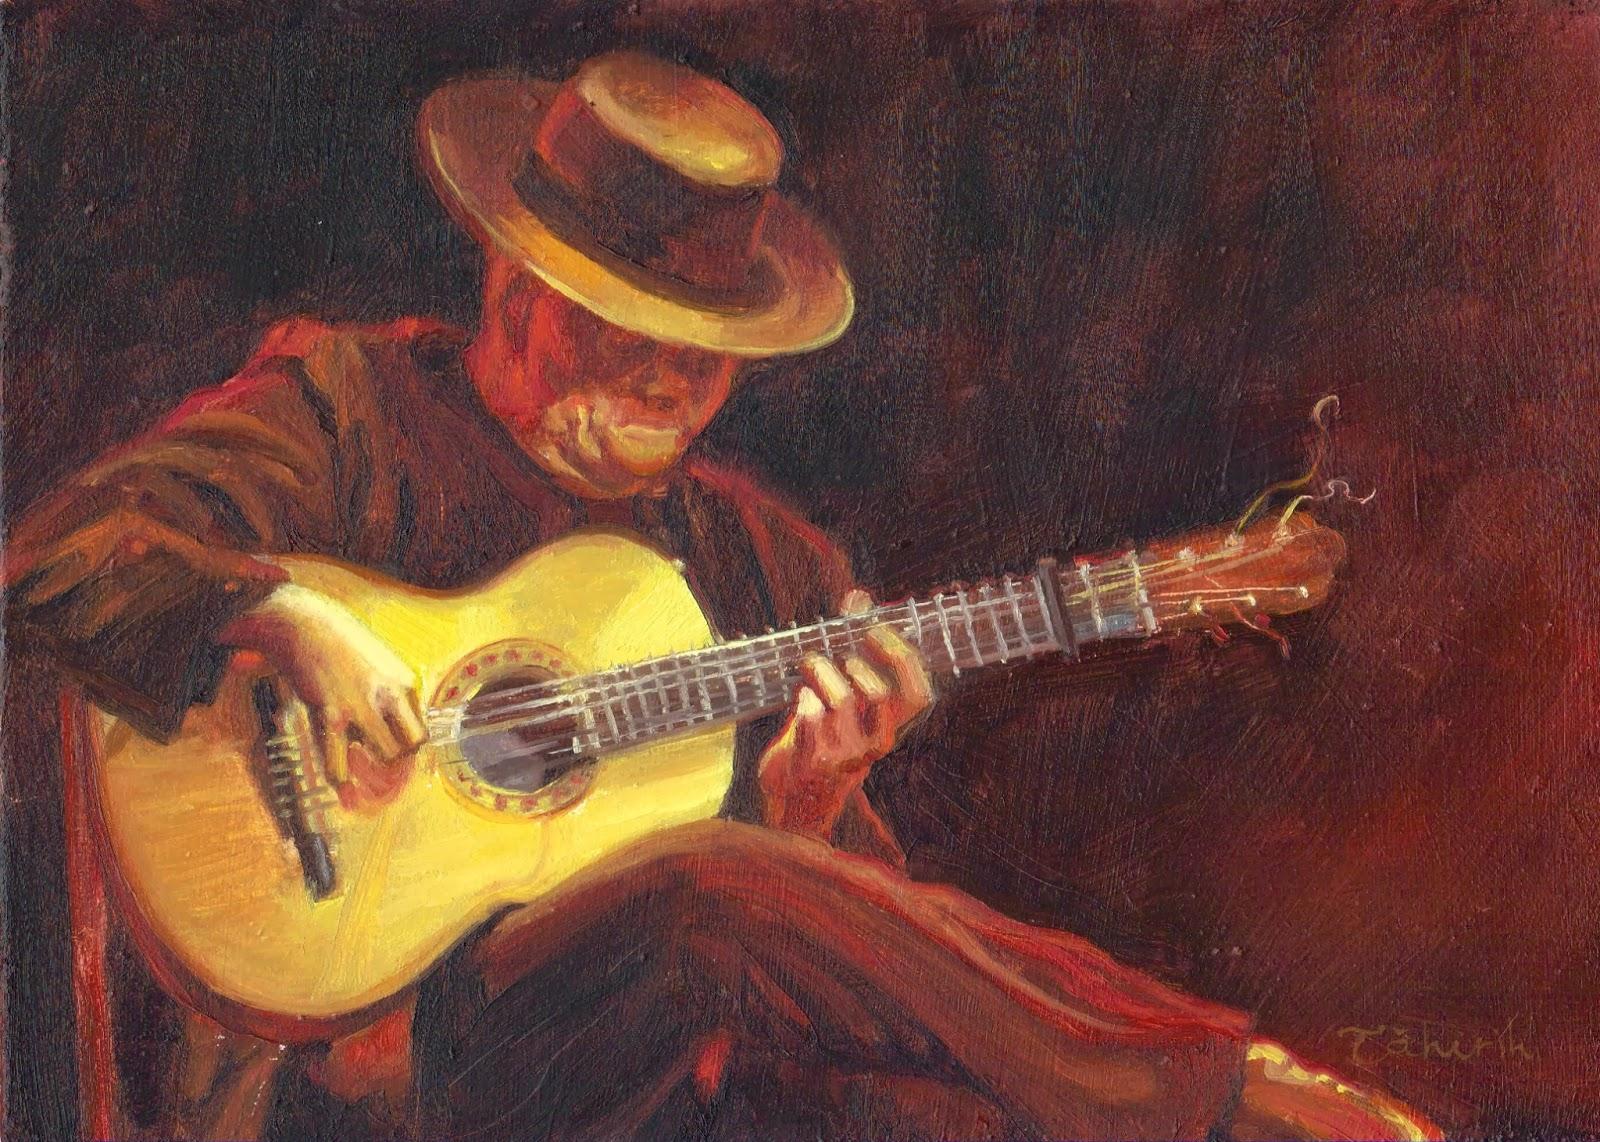 The Storyteller Man Playing Flamenco Guitar